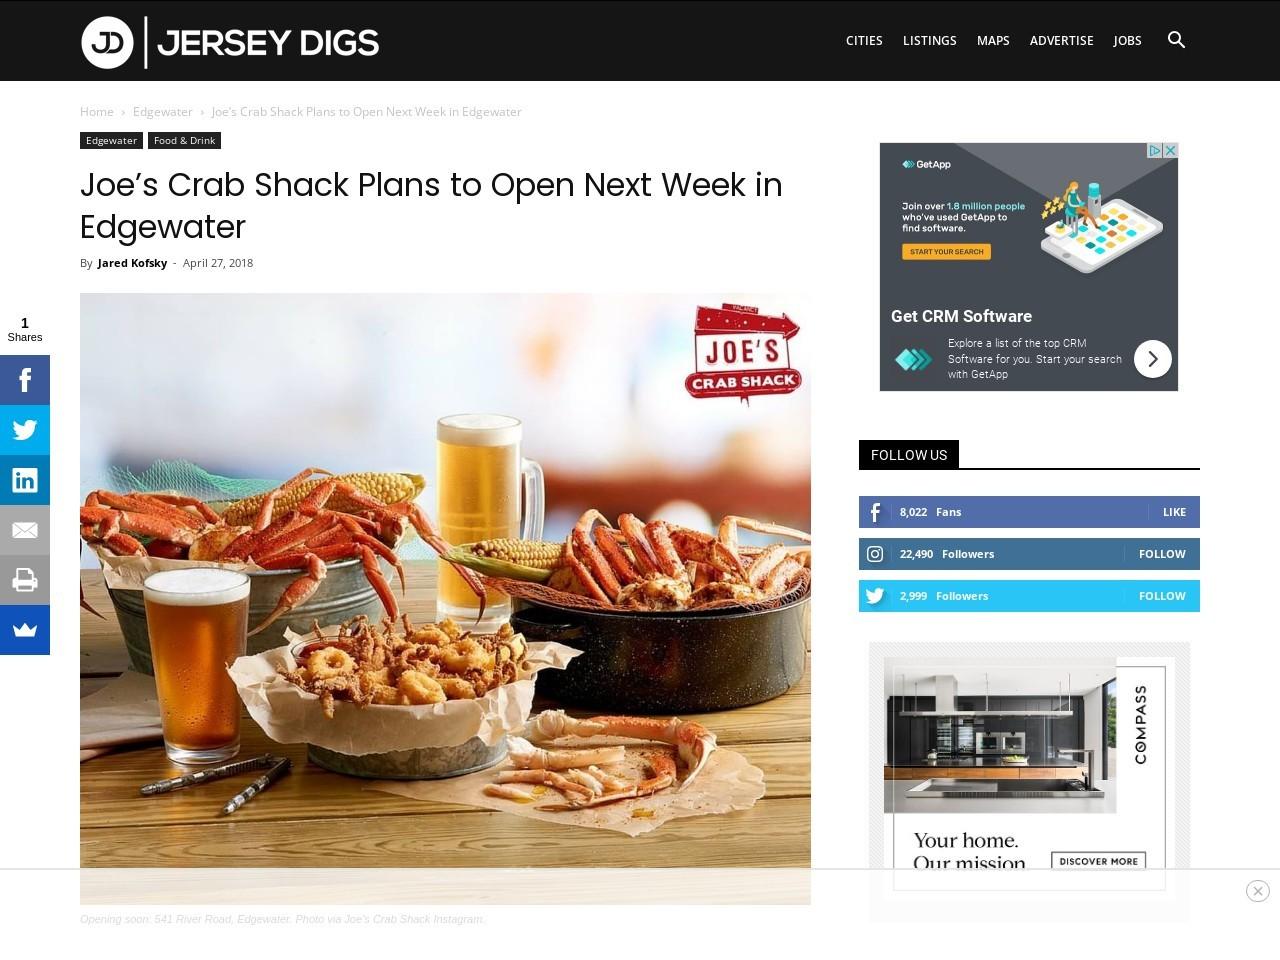 Joe's Crab Shack Plans to Open Next Week in Edgewater